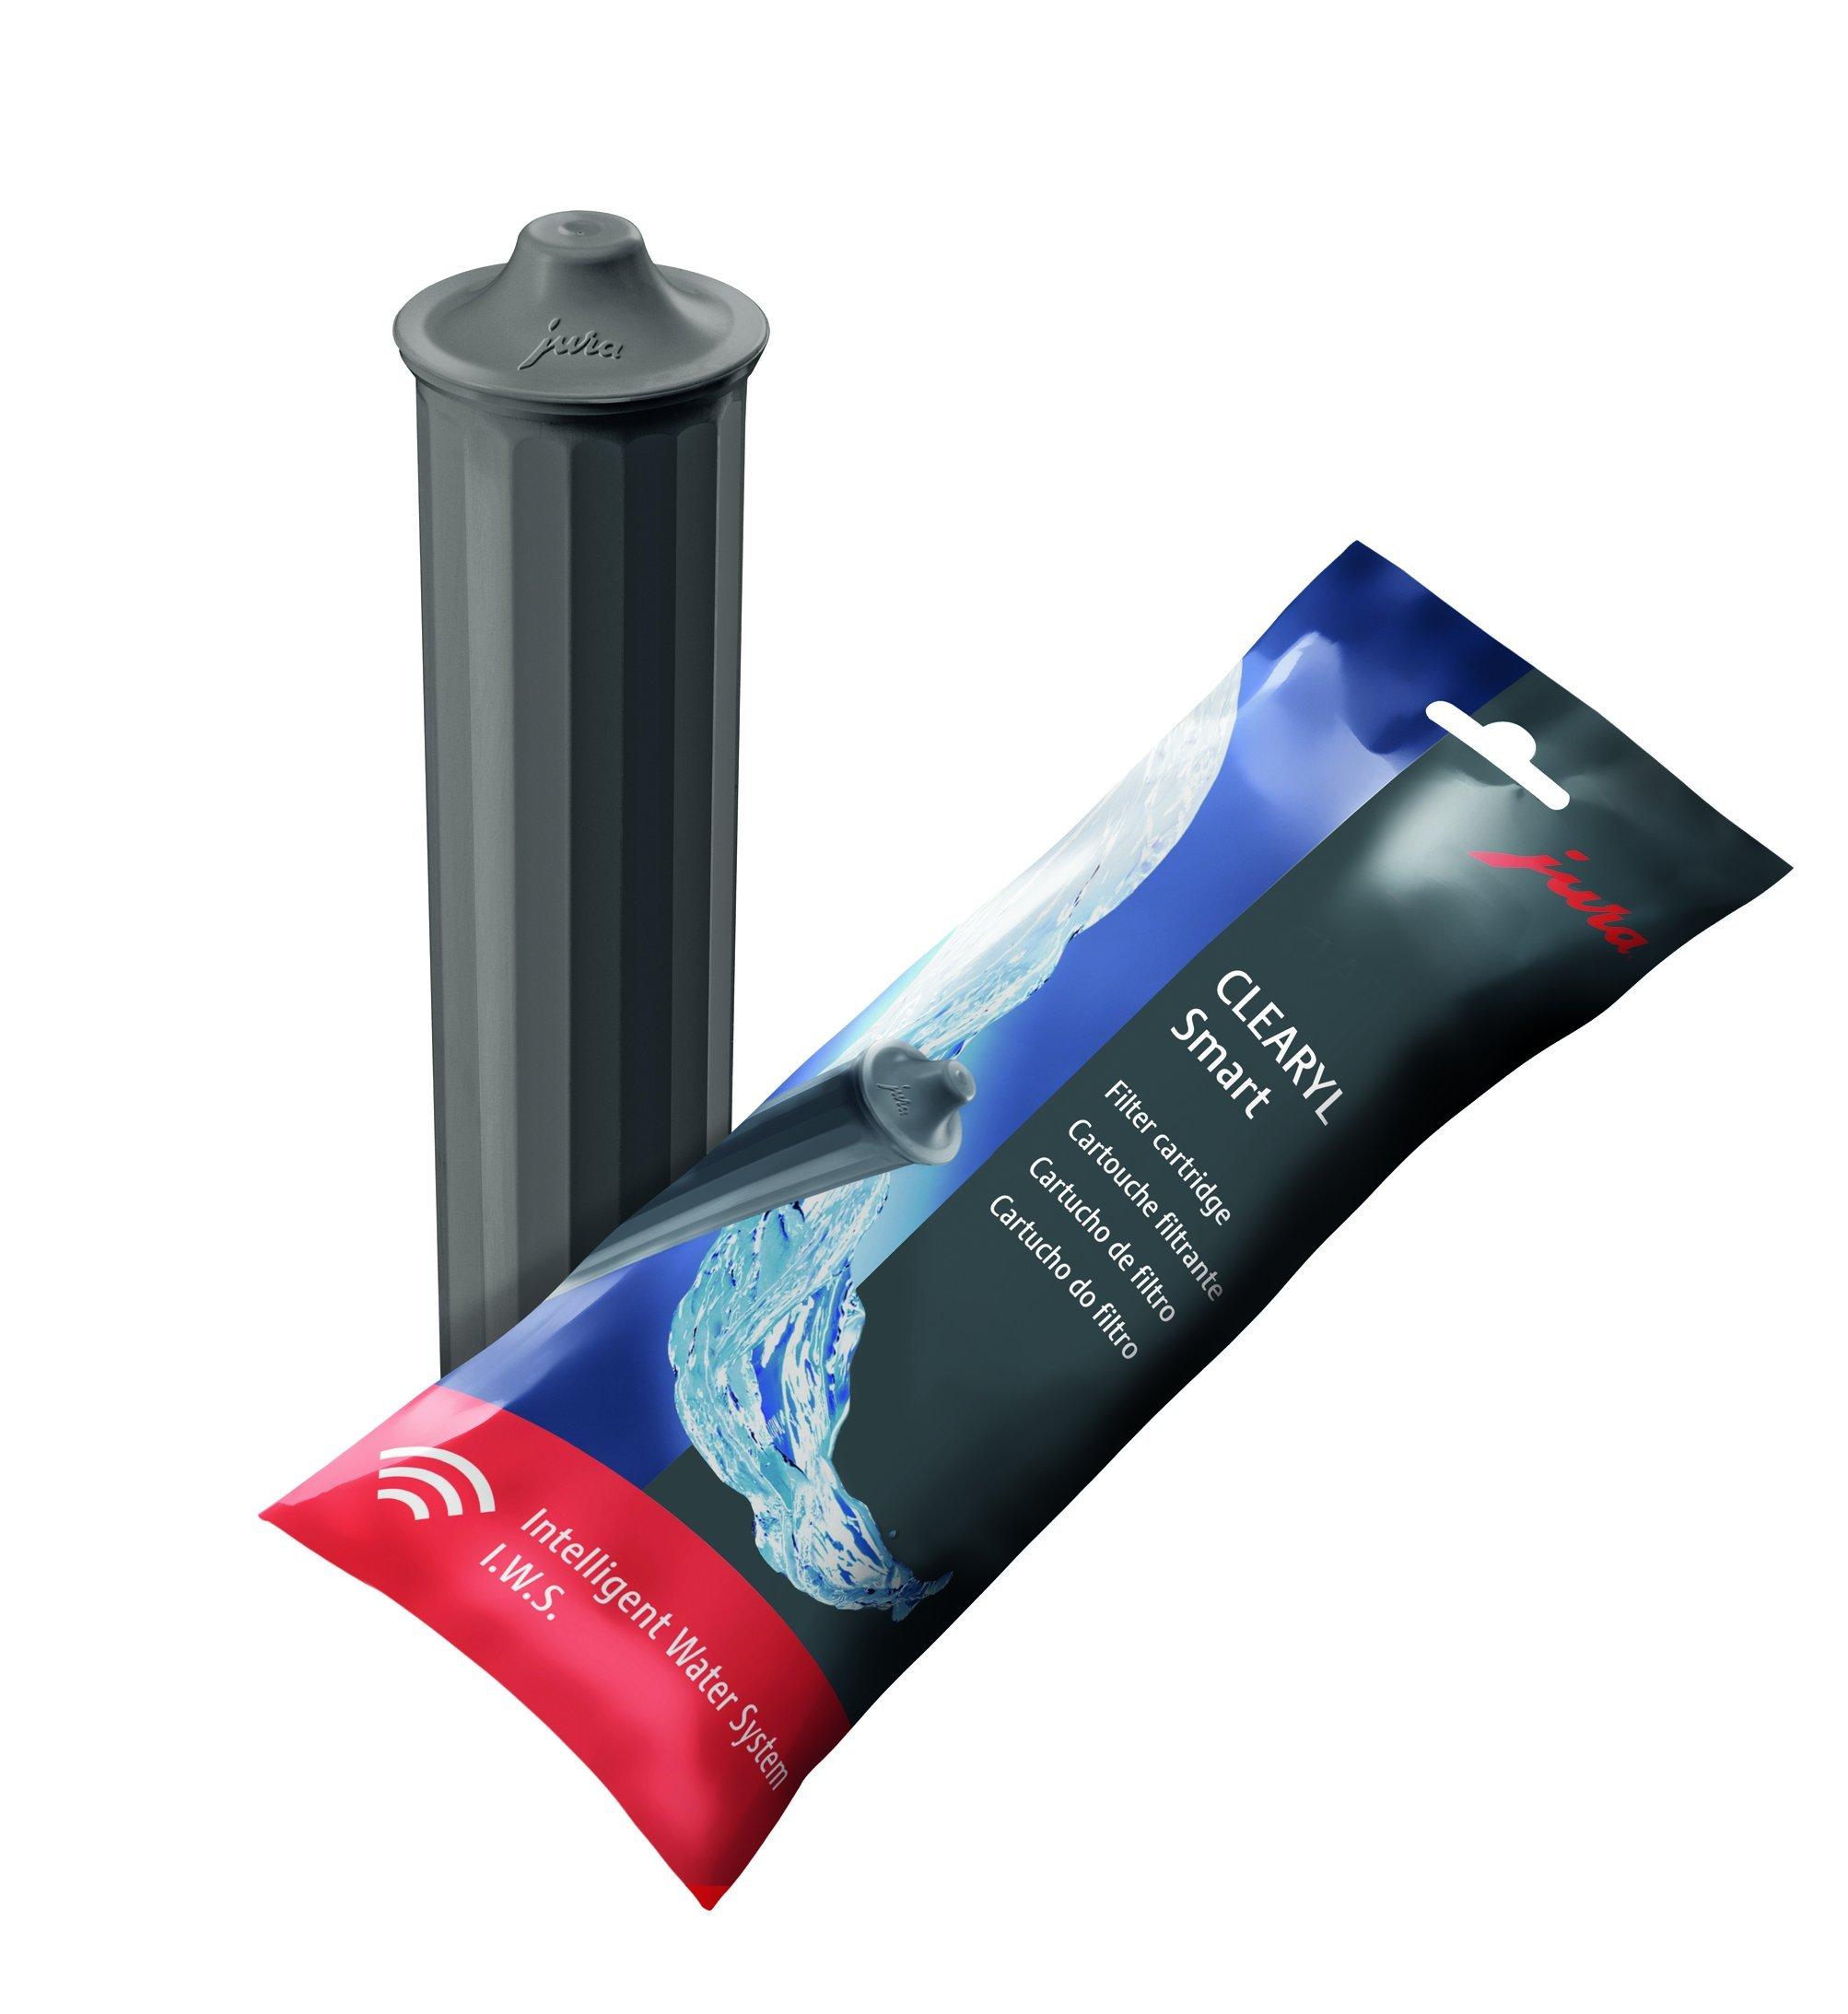 Jura 72629 Clearyl Smart Water Filter Cartridge (4 Filters)